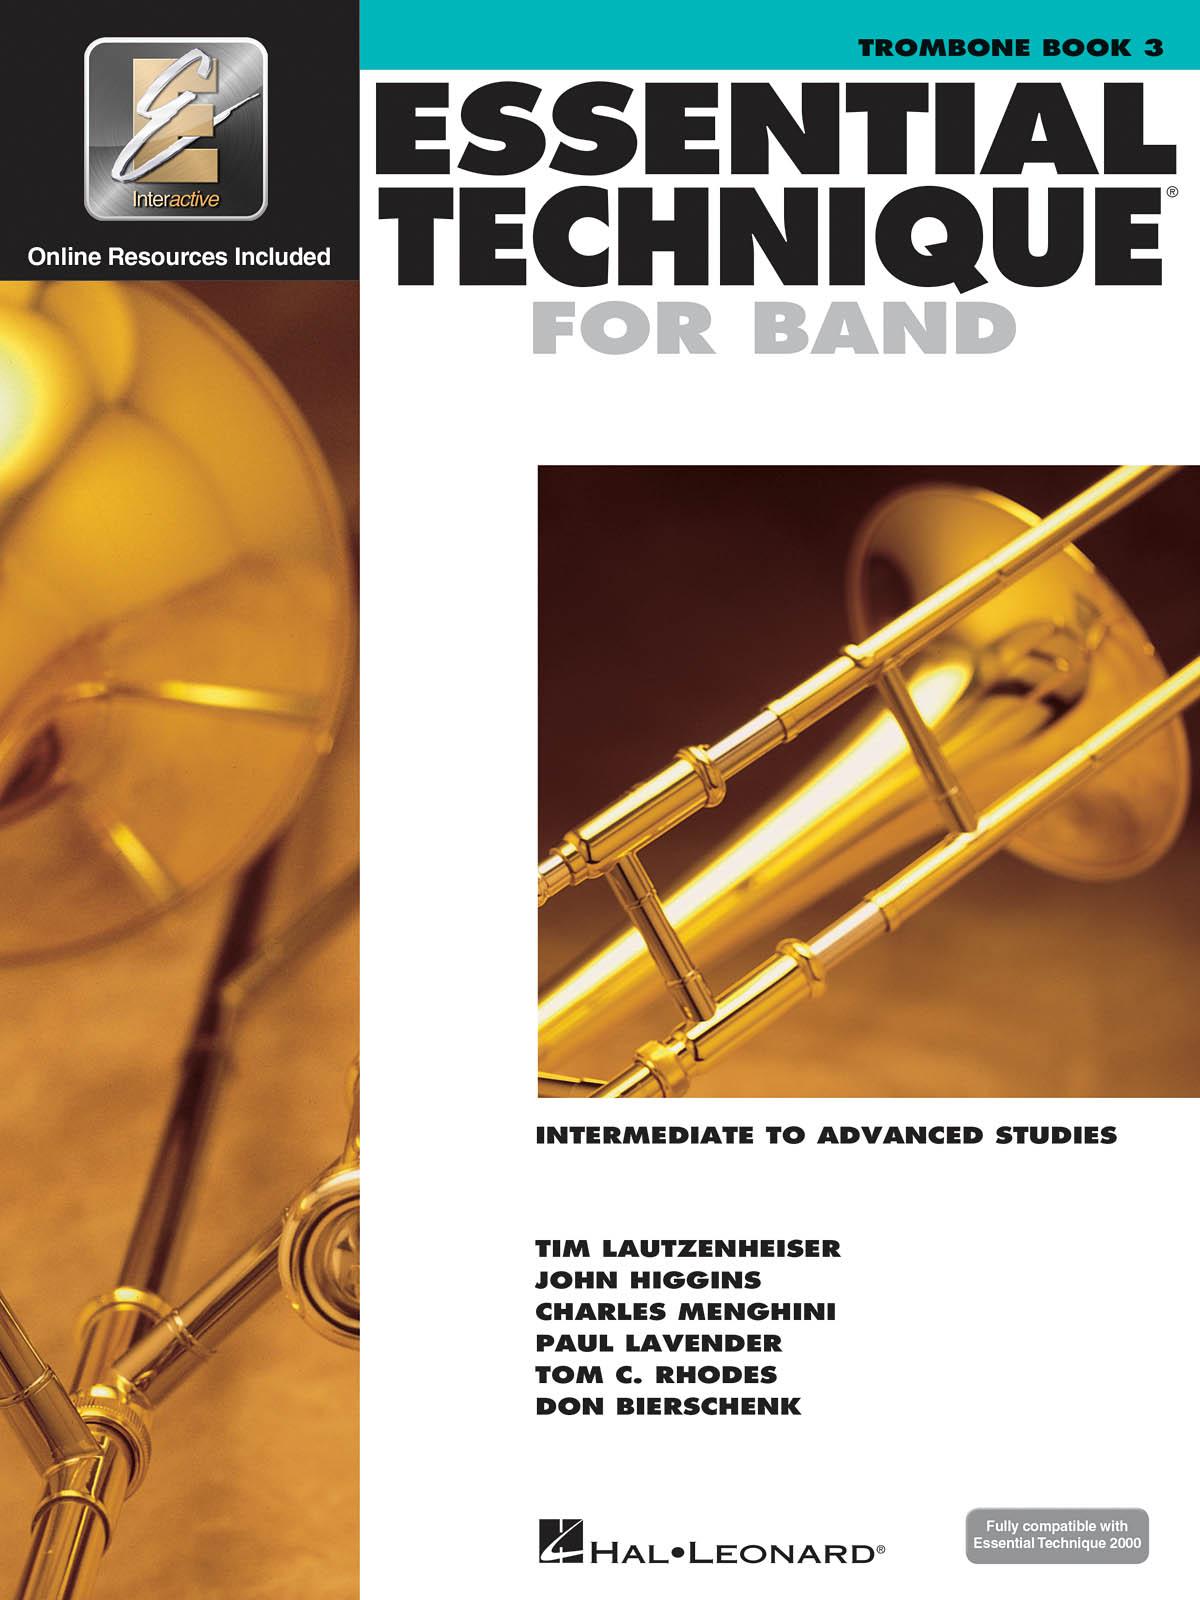 Essential Elements for Band - Book 3 - Trombone: Trombone Solo: Score